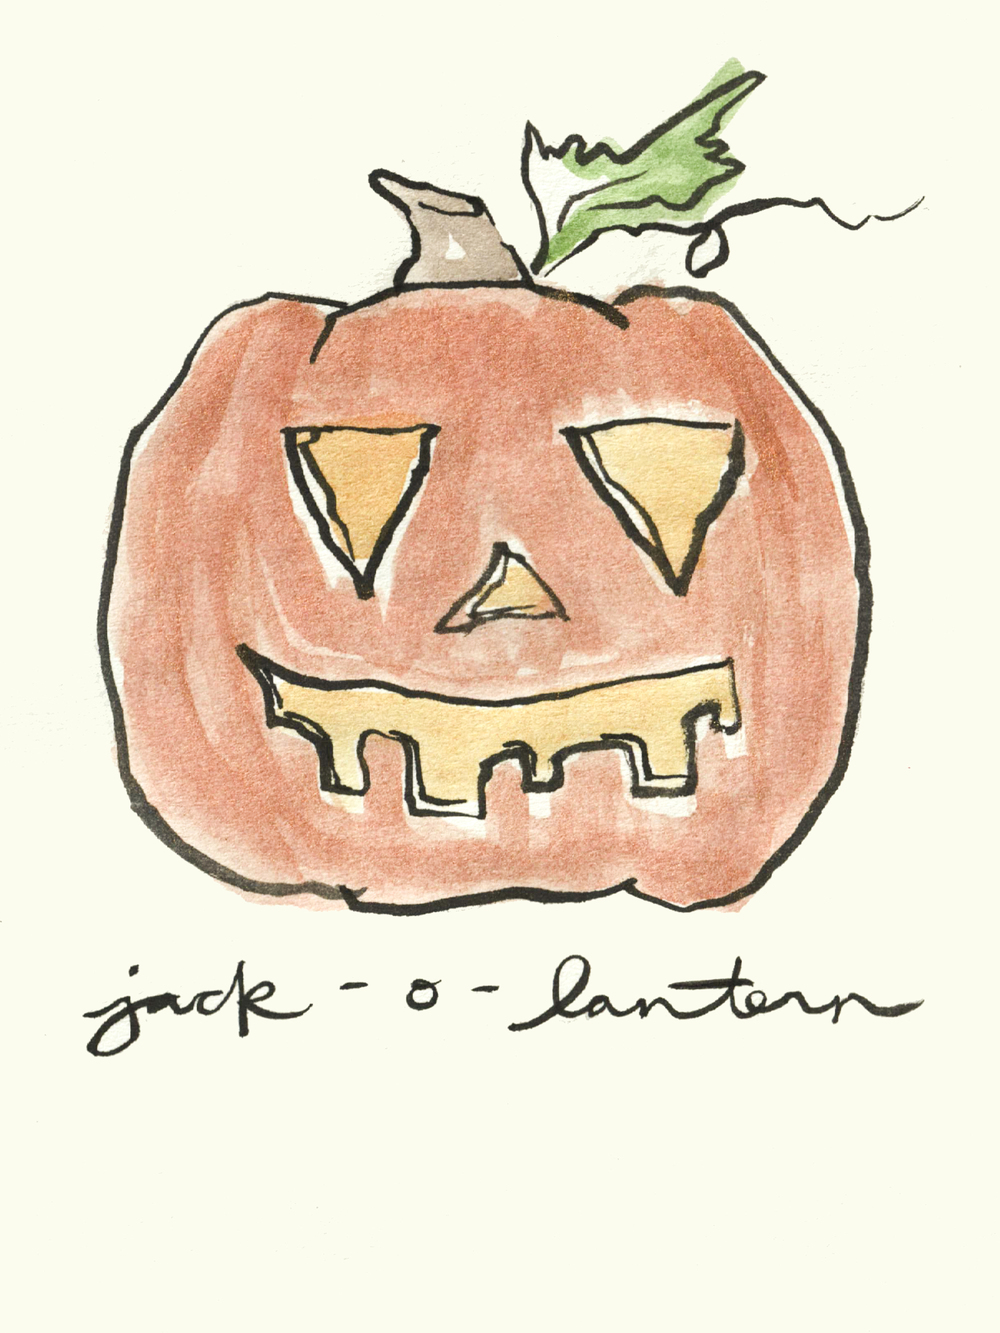 J_Jack-o-Lantern.jpg